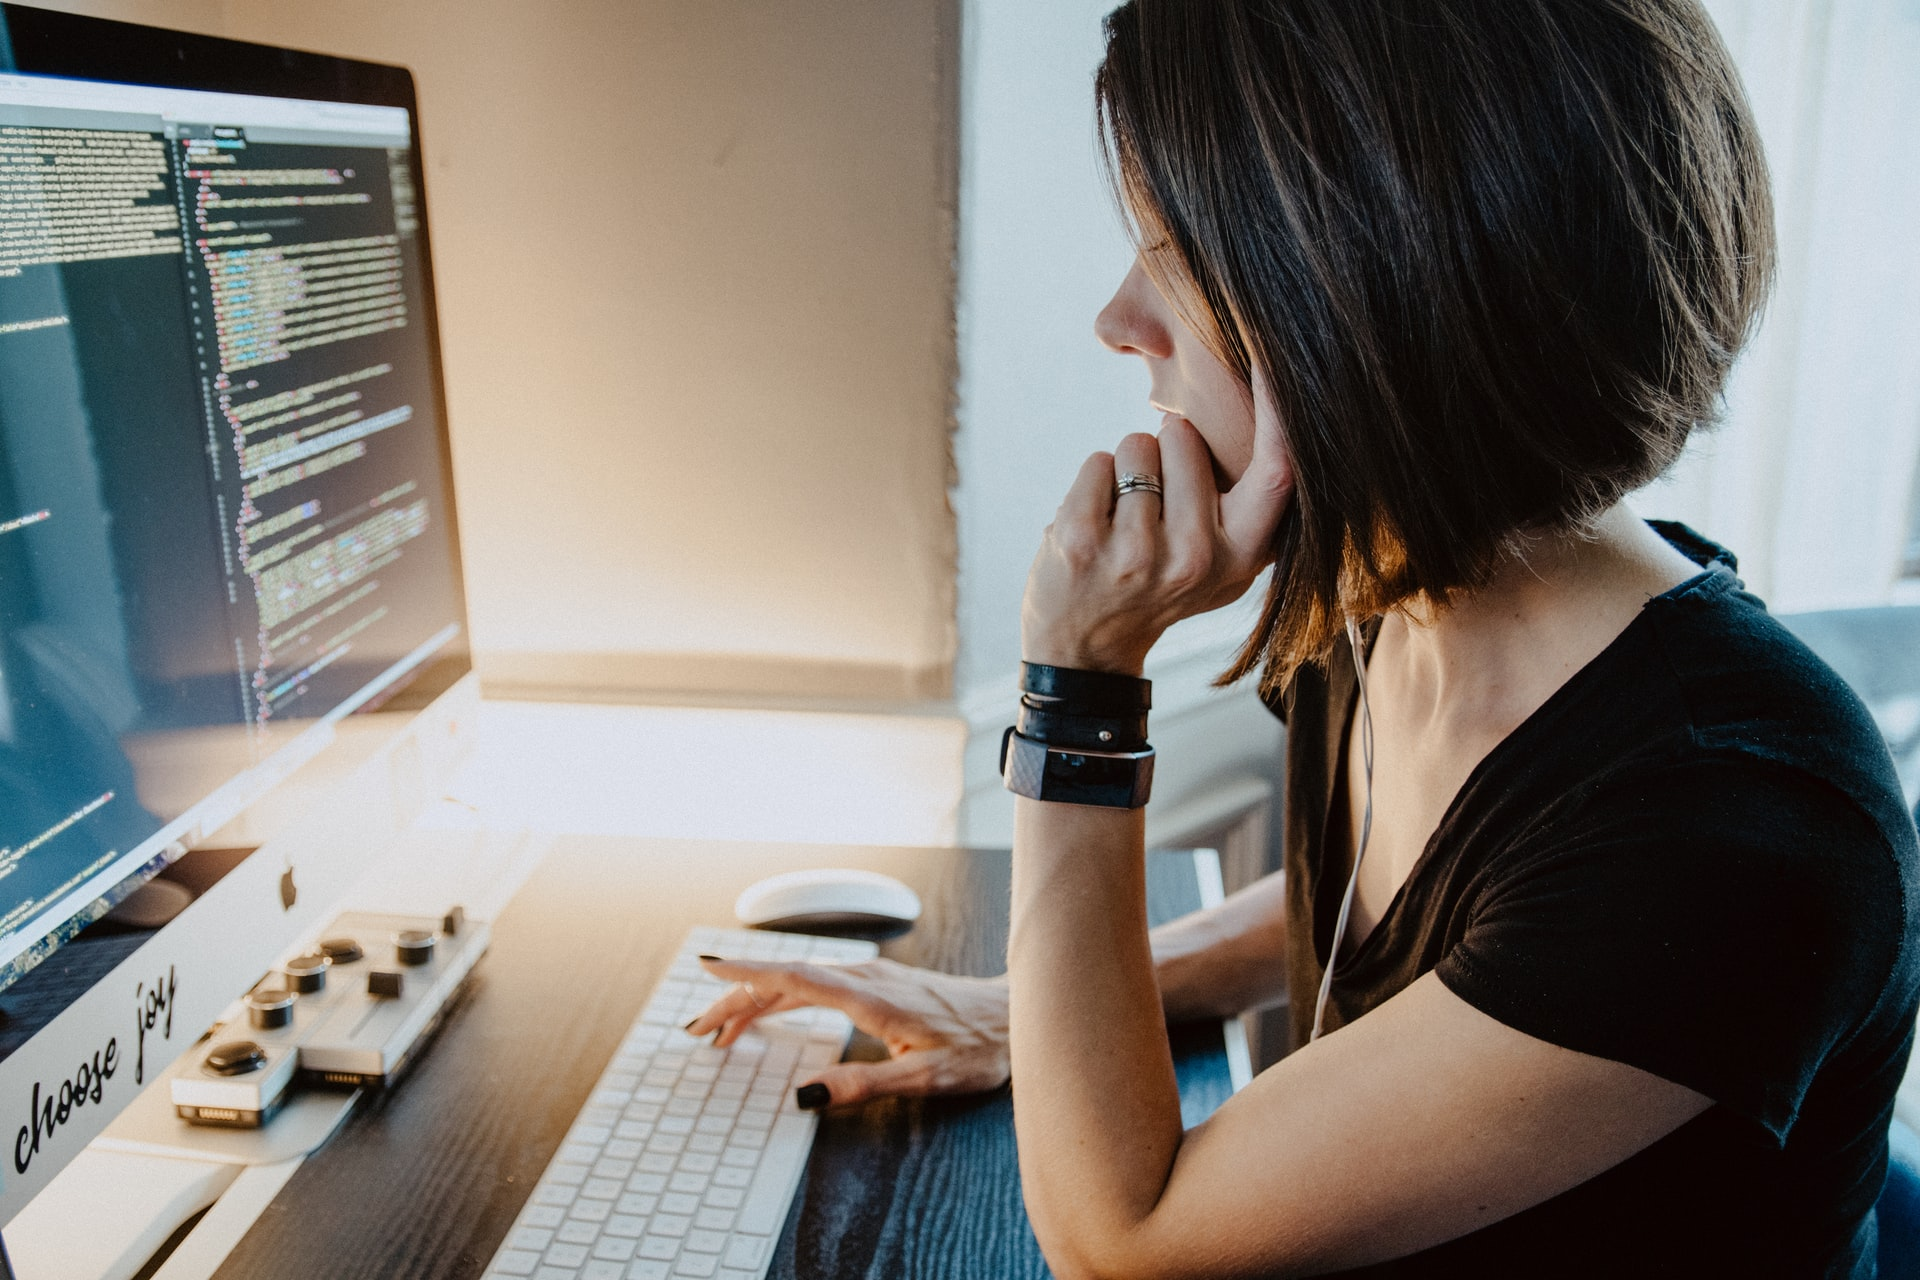 woman programming